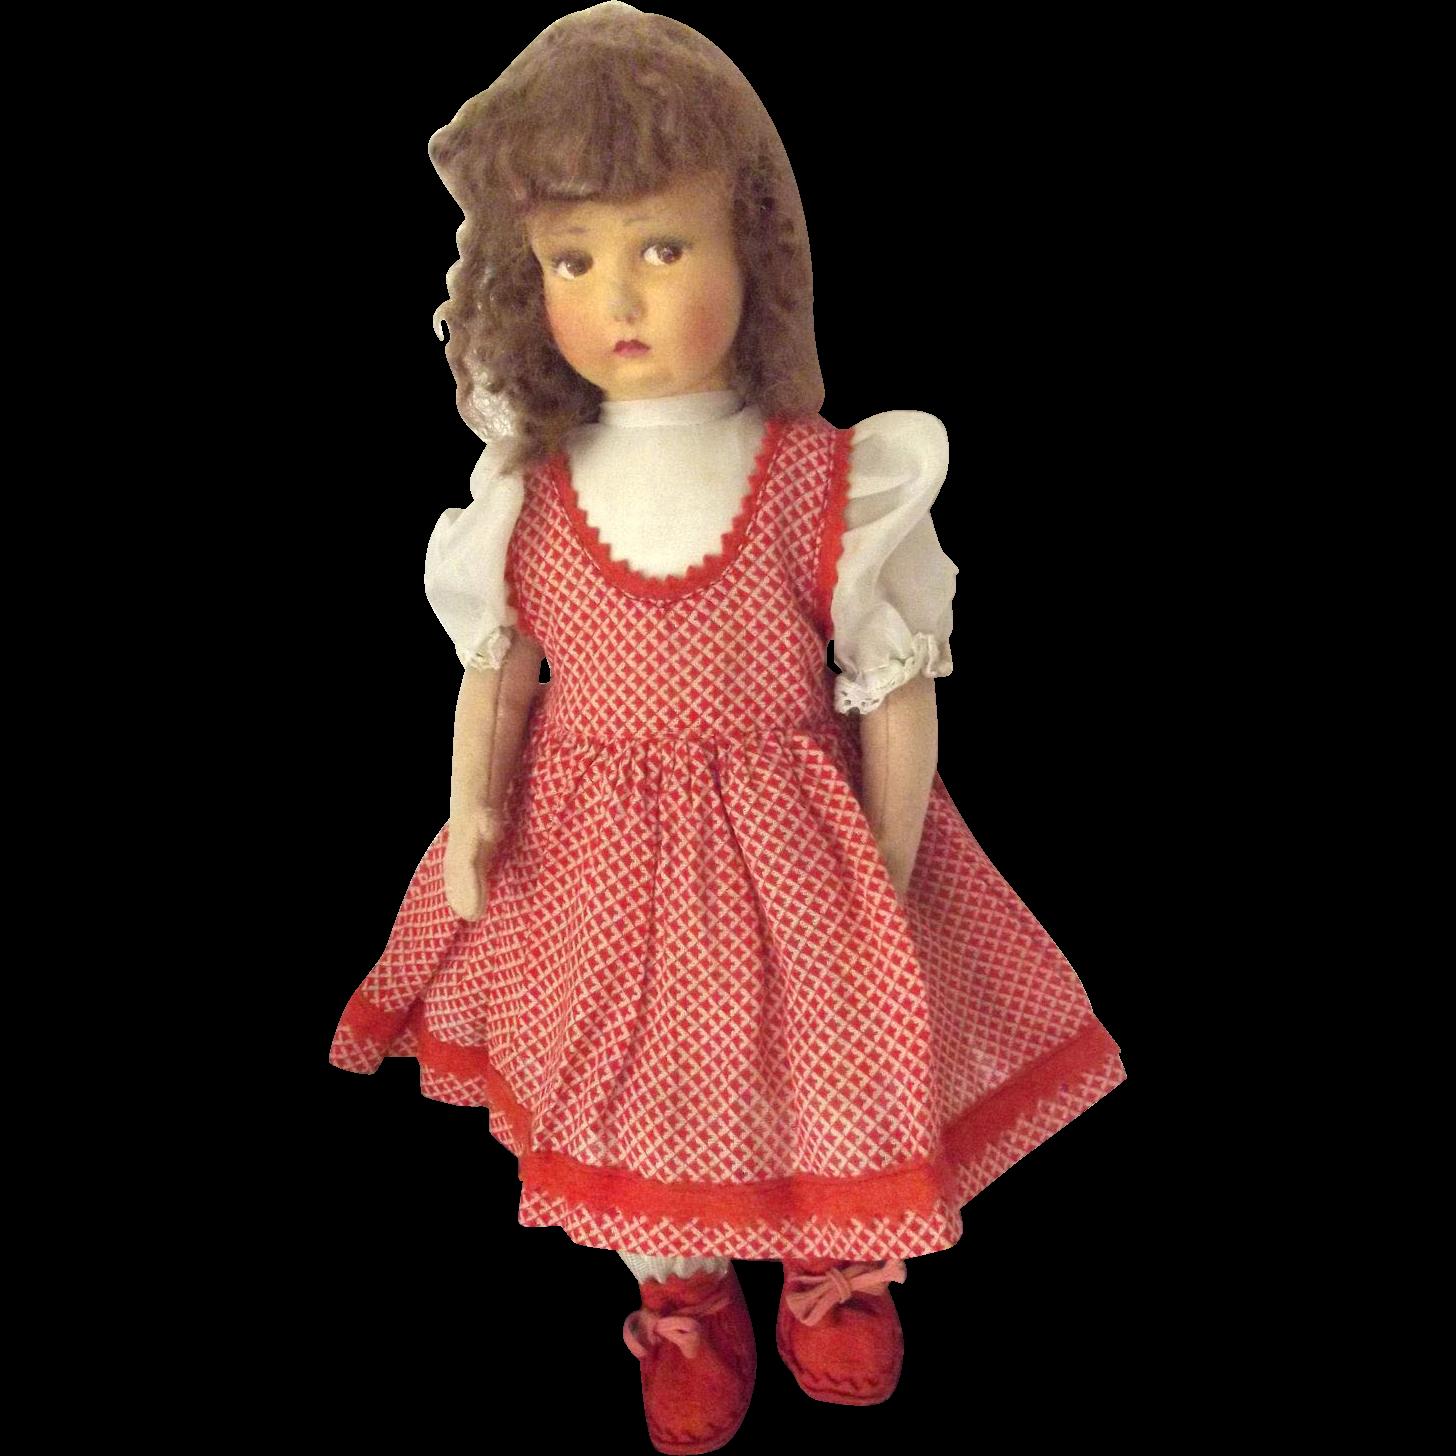 Lenci Type Felt Doll From Fhtv On Ruby Lane